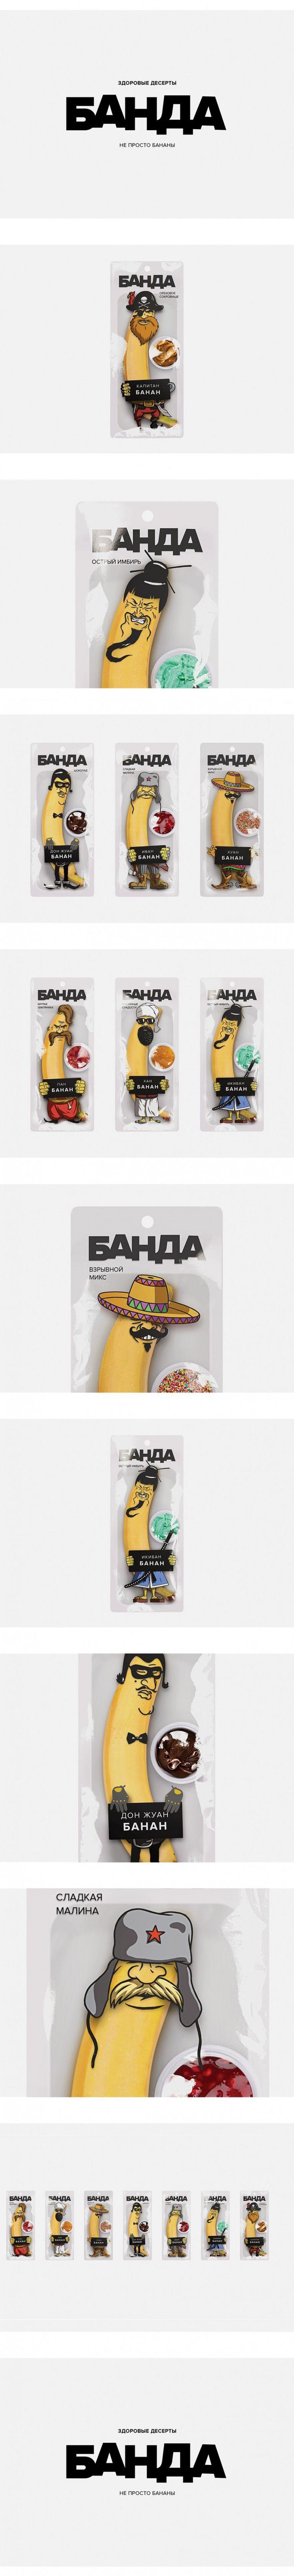 TheBestPackaging.ru – Банда – сладкий десерт (Концепт)